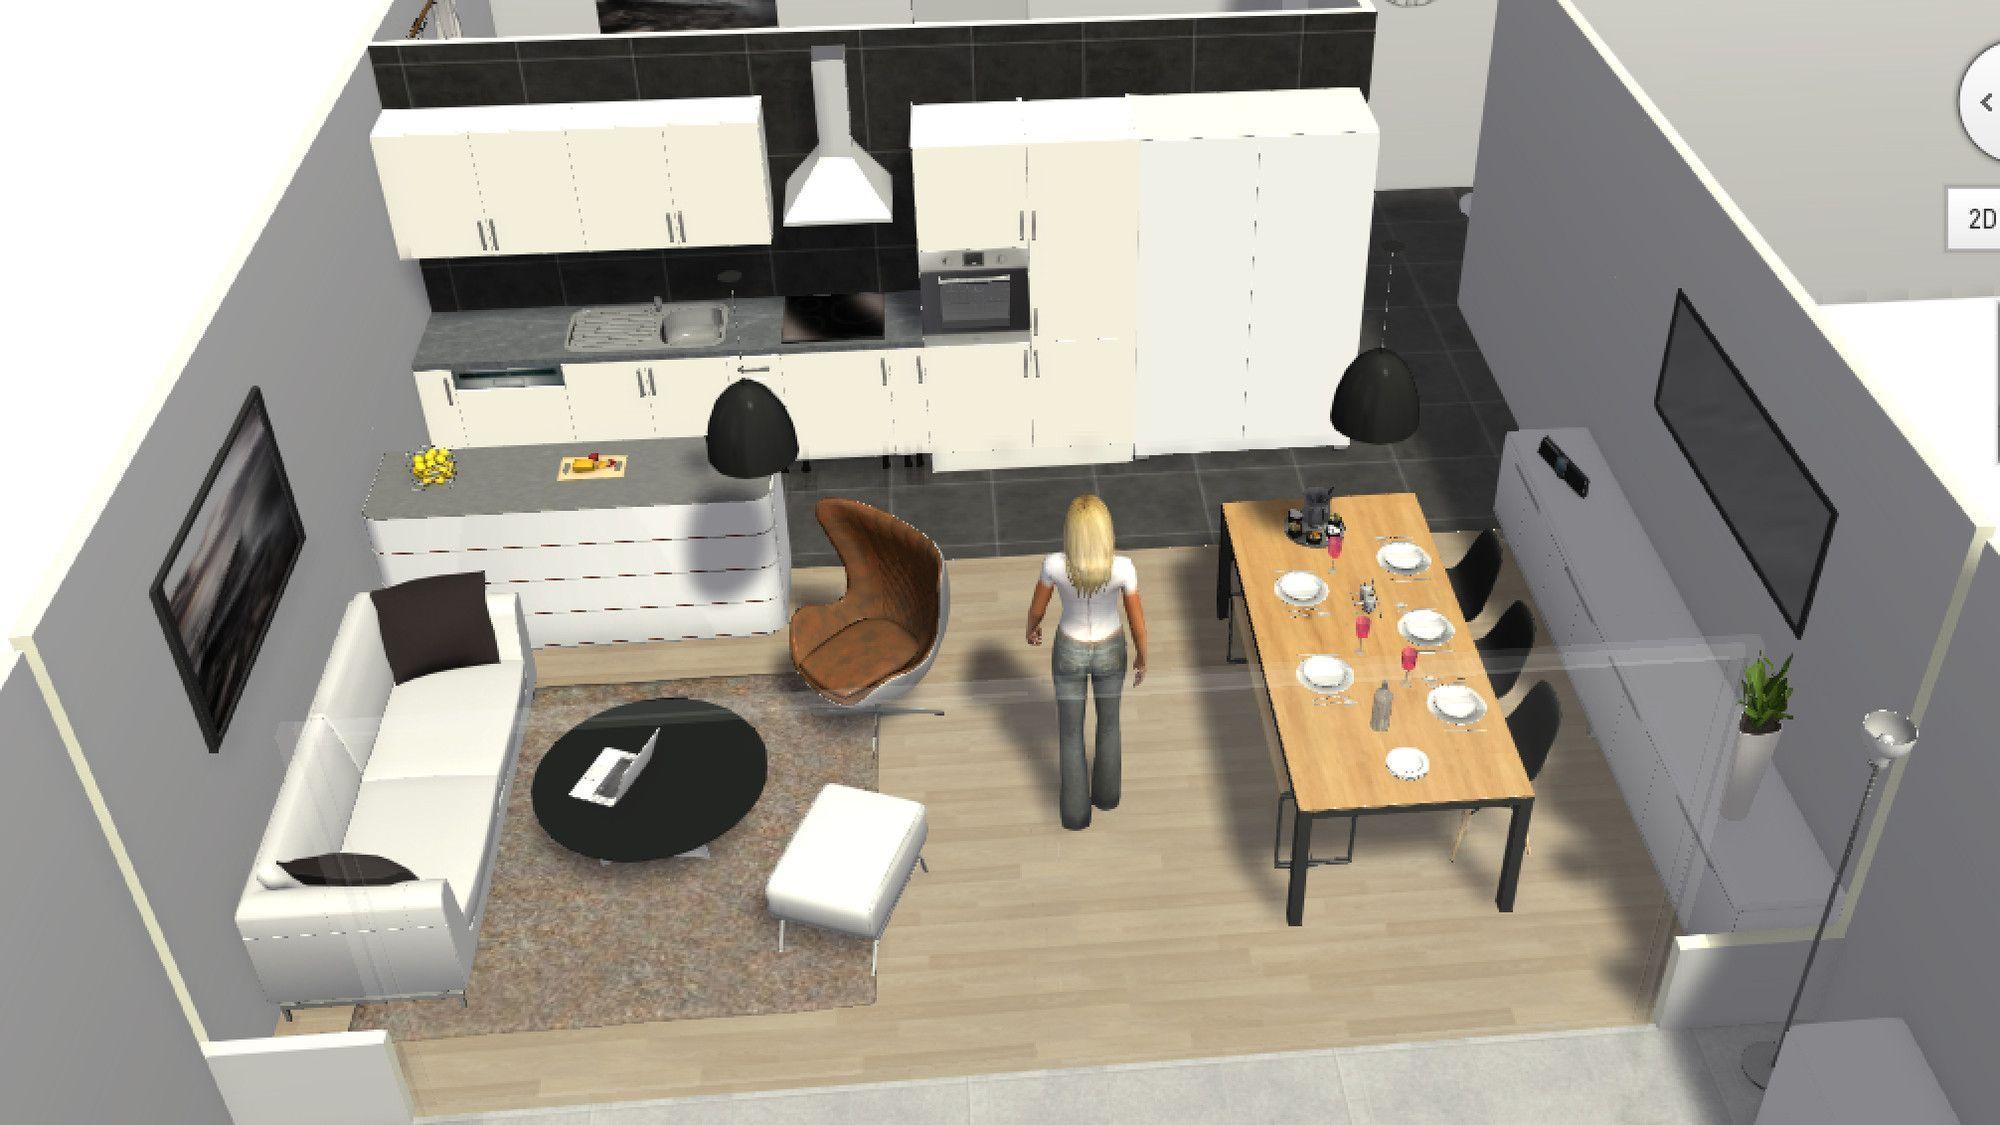 Cuisine Salon Salle A Manger 30m2 Cuisine Moderne 2019 Amenager Petit Salon Salle A Manger Amenagement Petit Salon Amenagement Salon